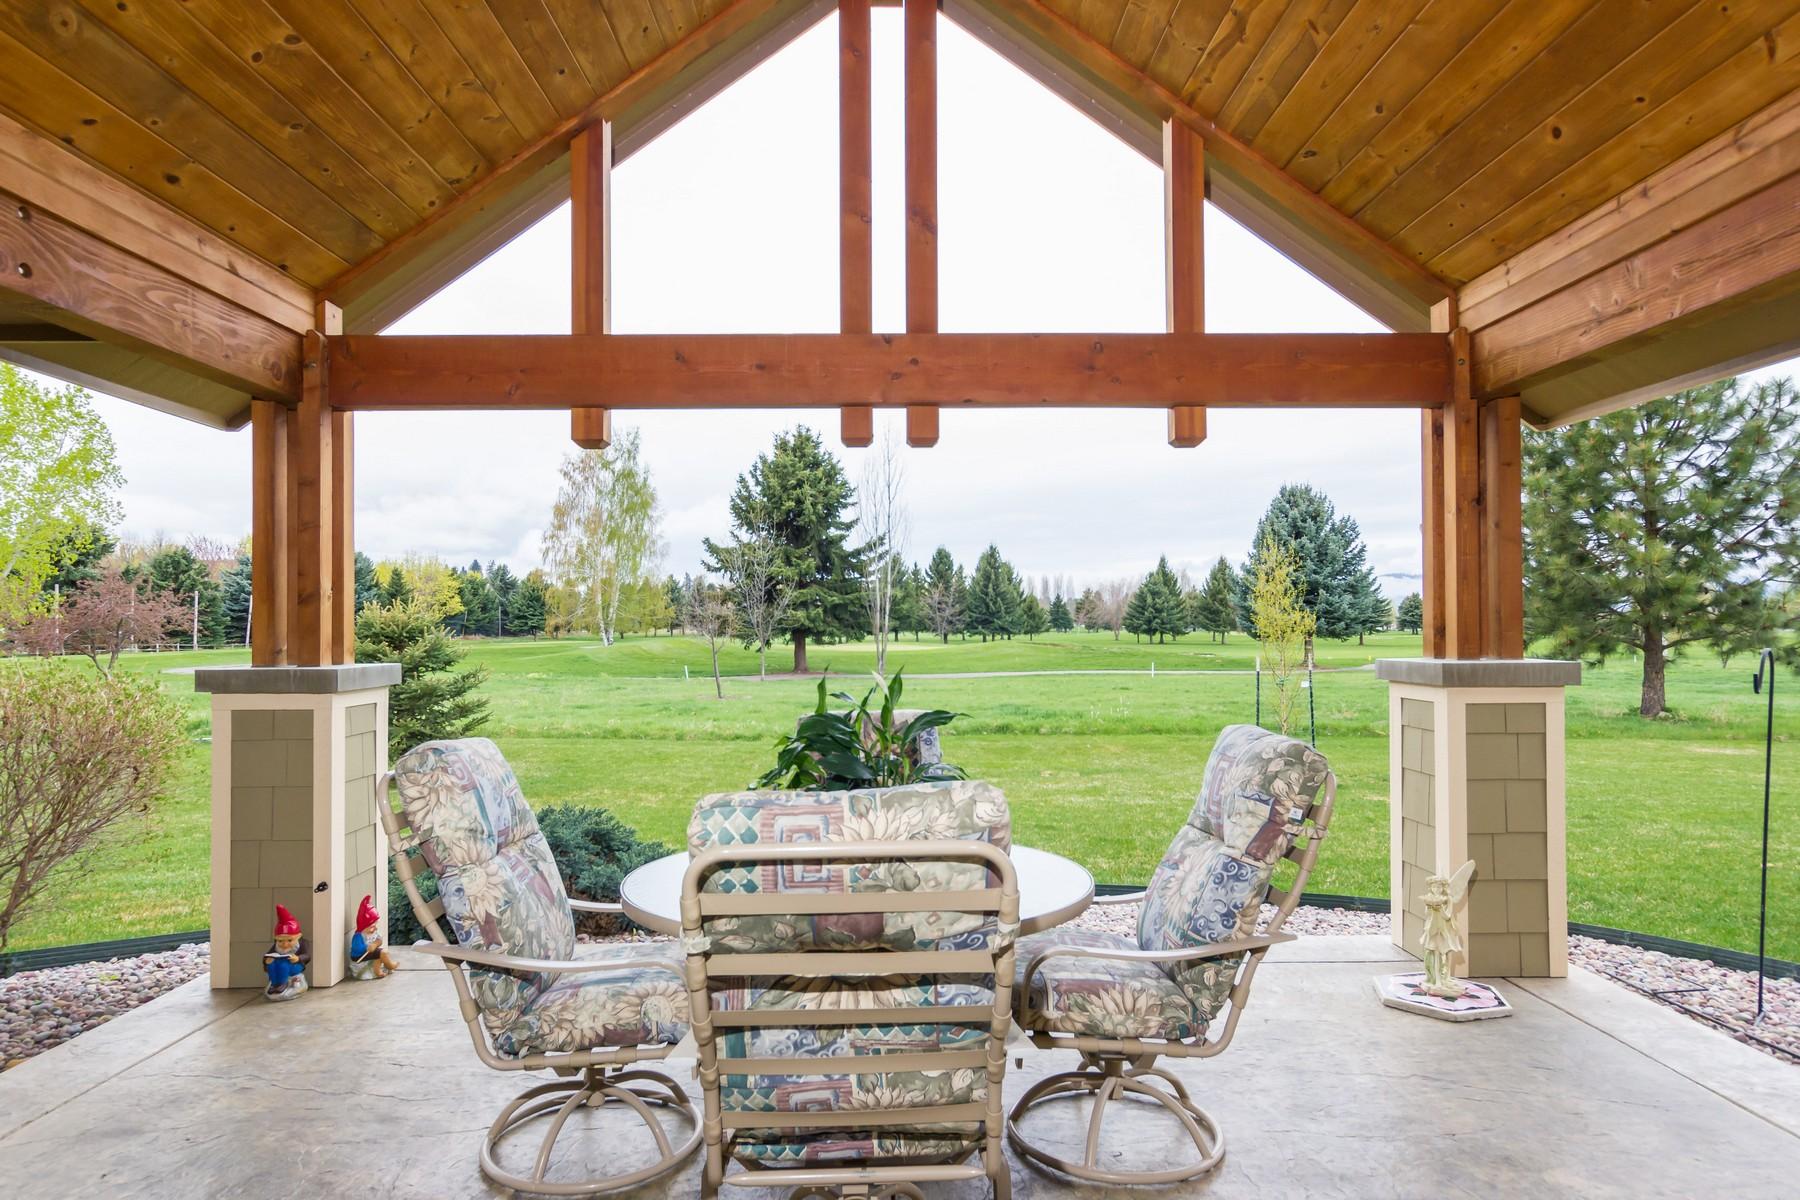 Таунхаус для того Продажа на Golf Course 110 Yellowstone Court Polson, Монтана, 59860 Соединенные Штаты